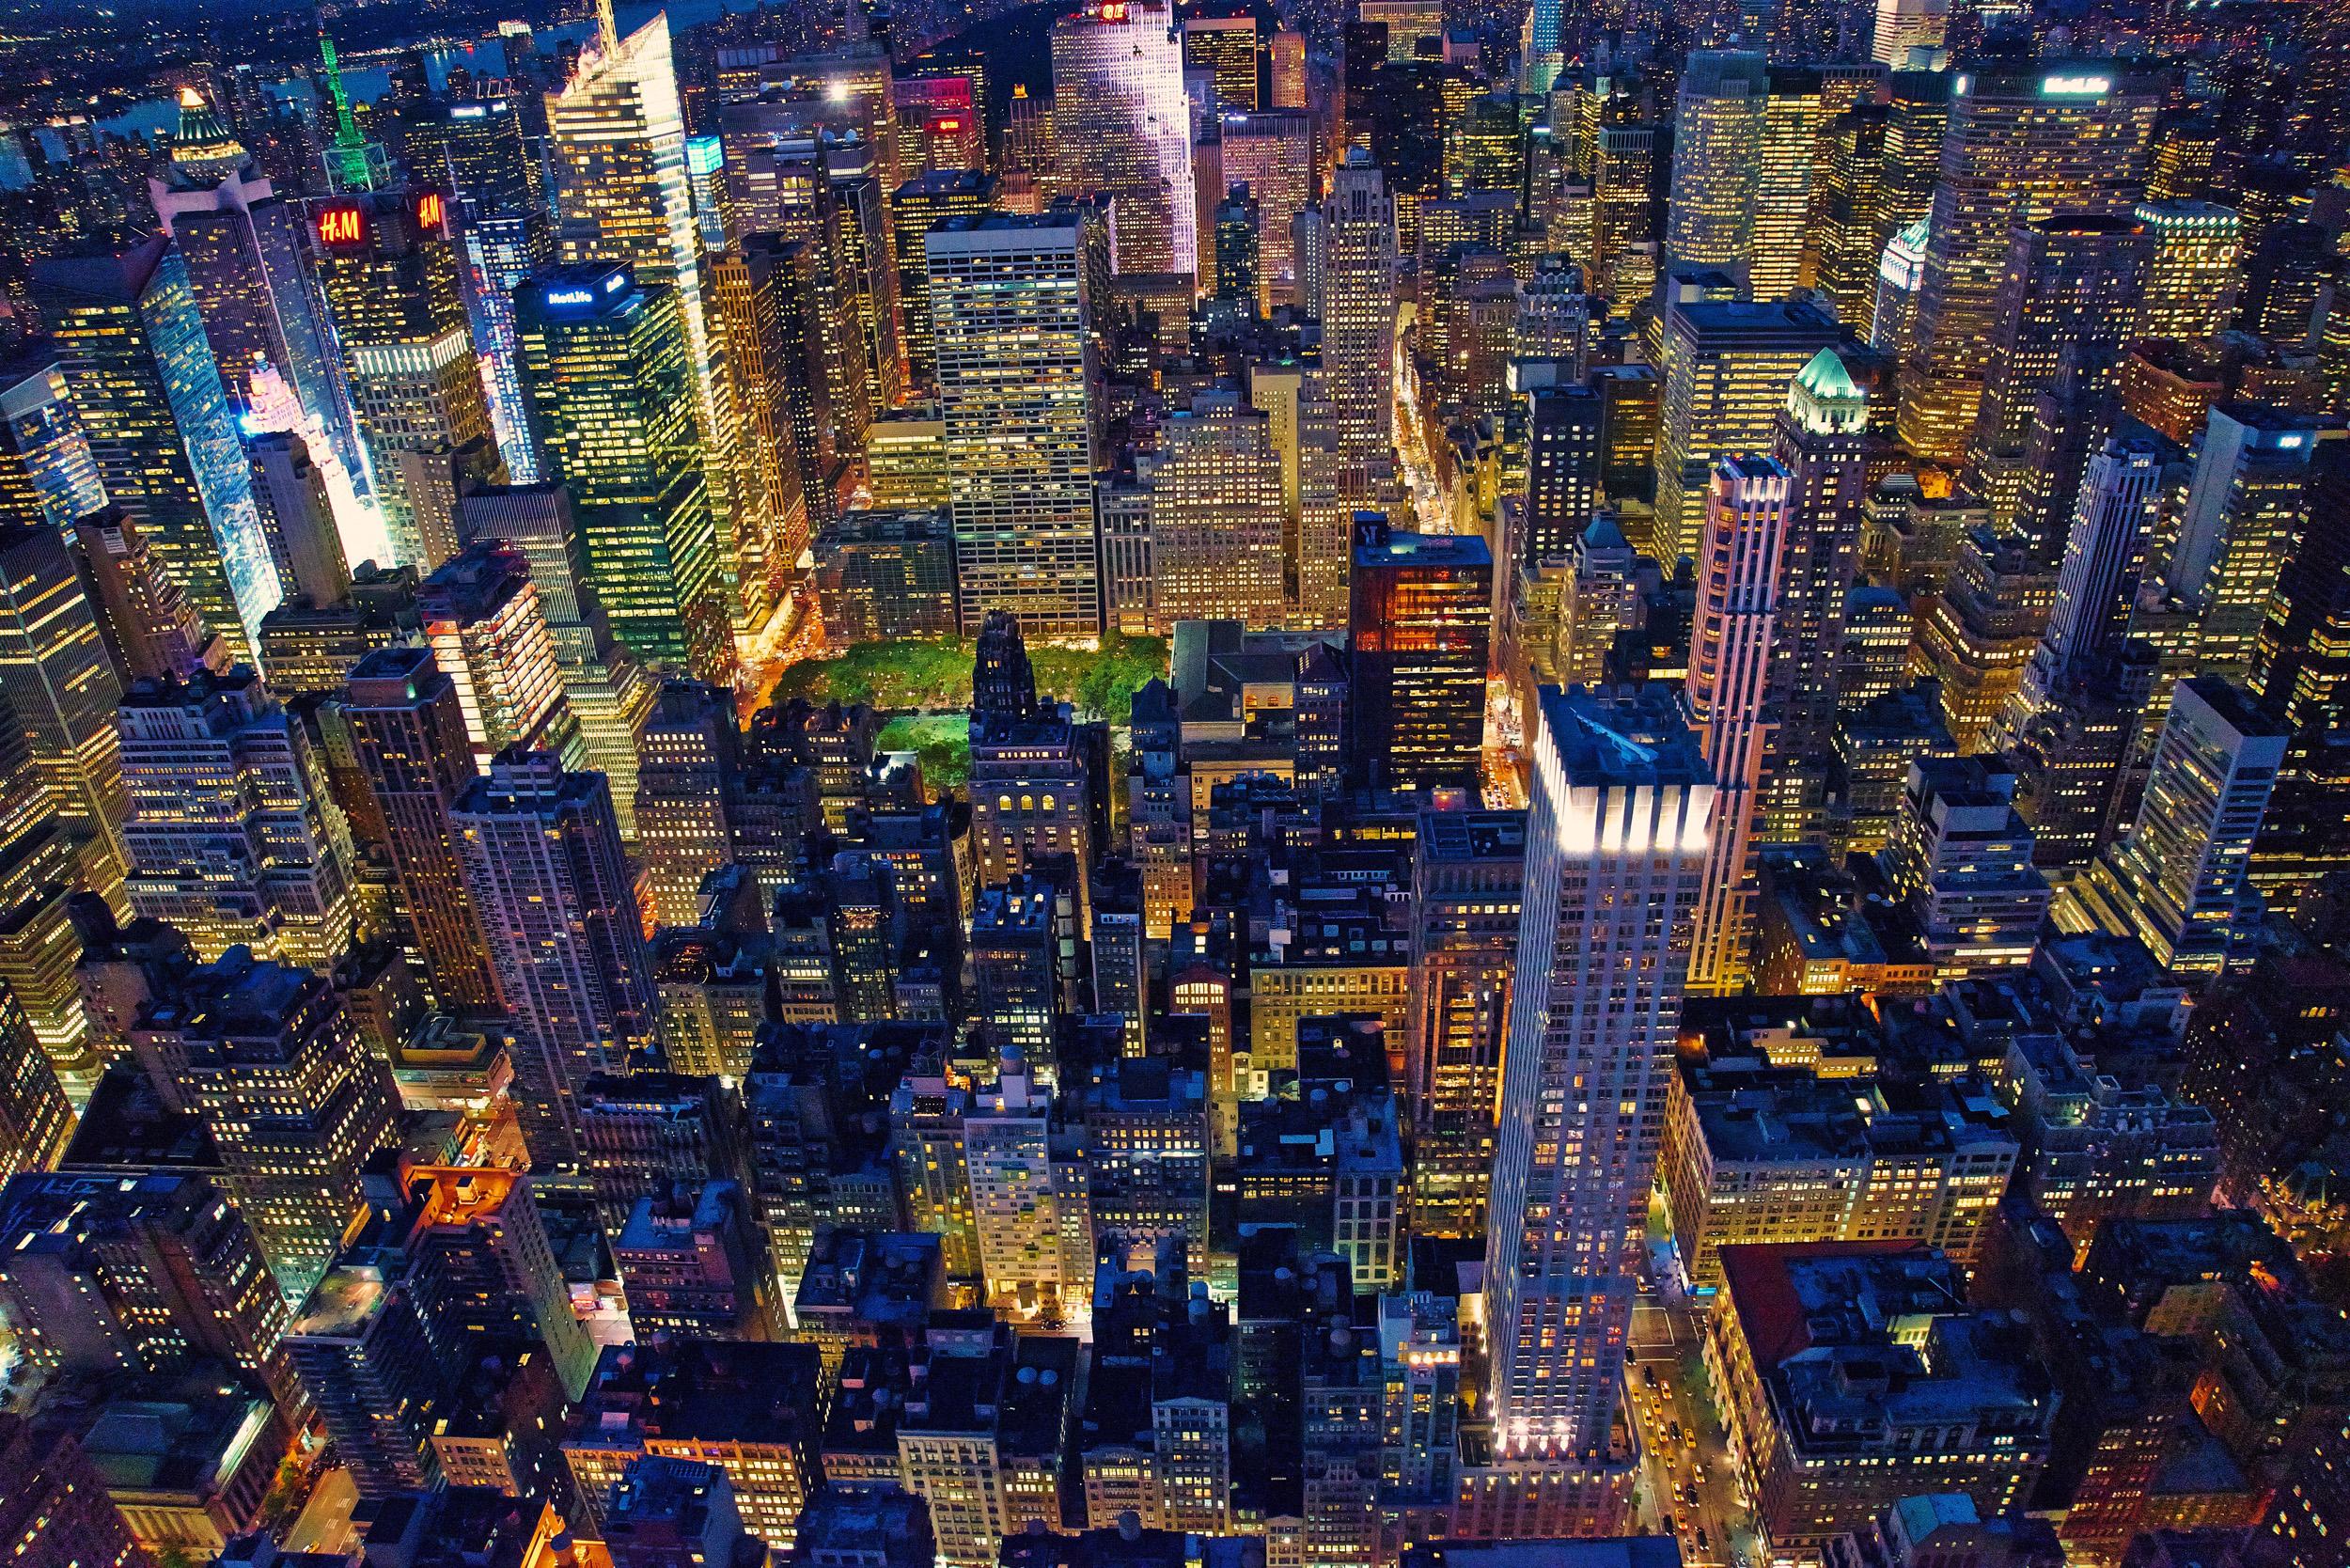 New York Night # 3